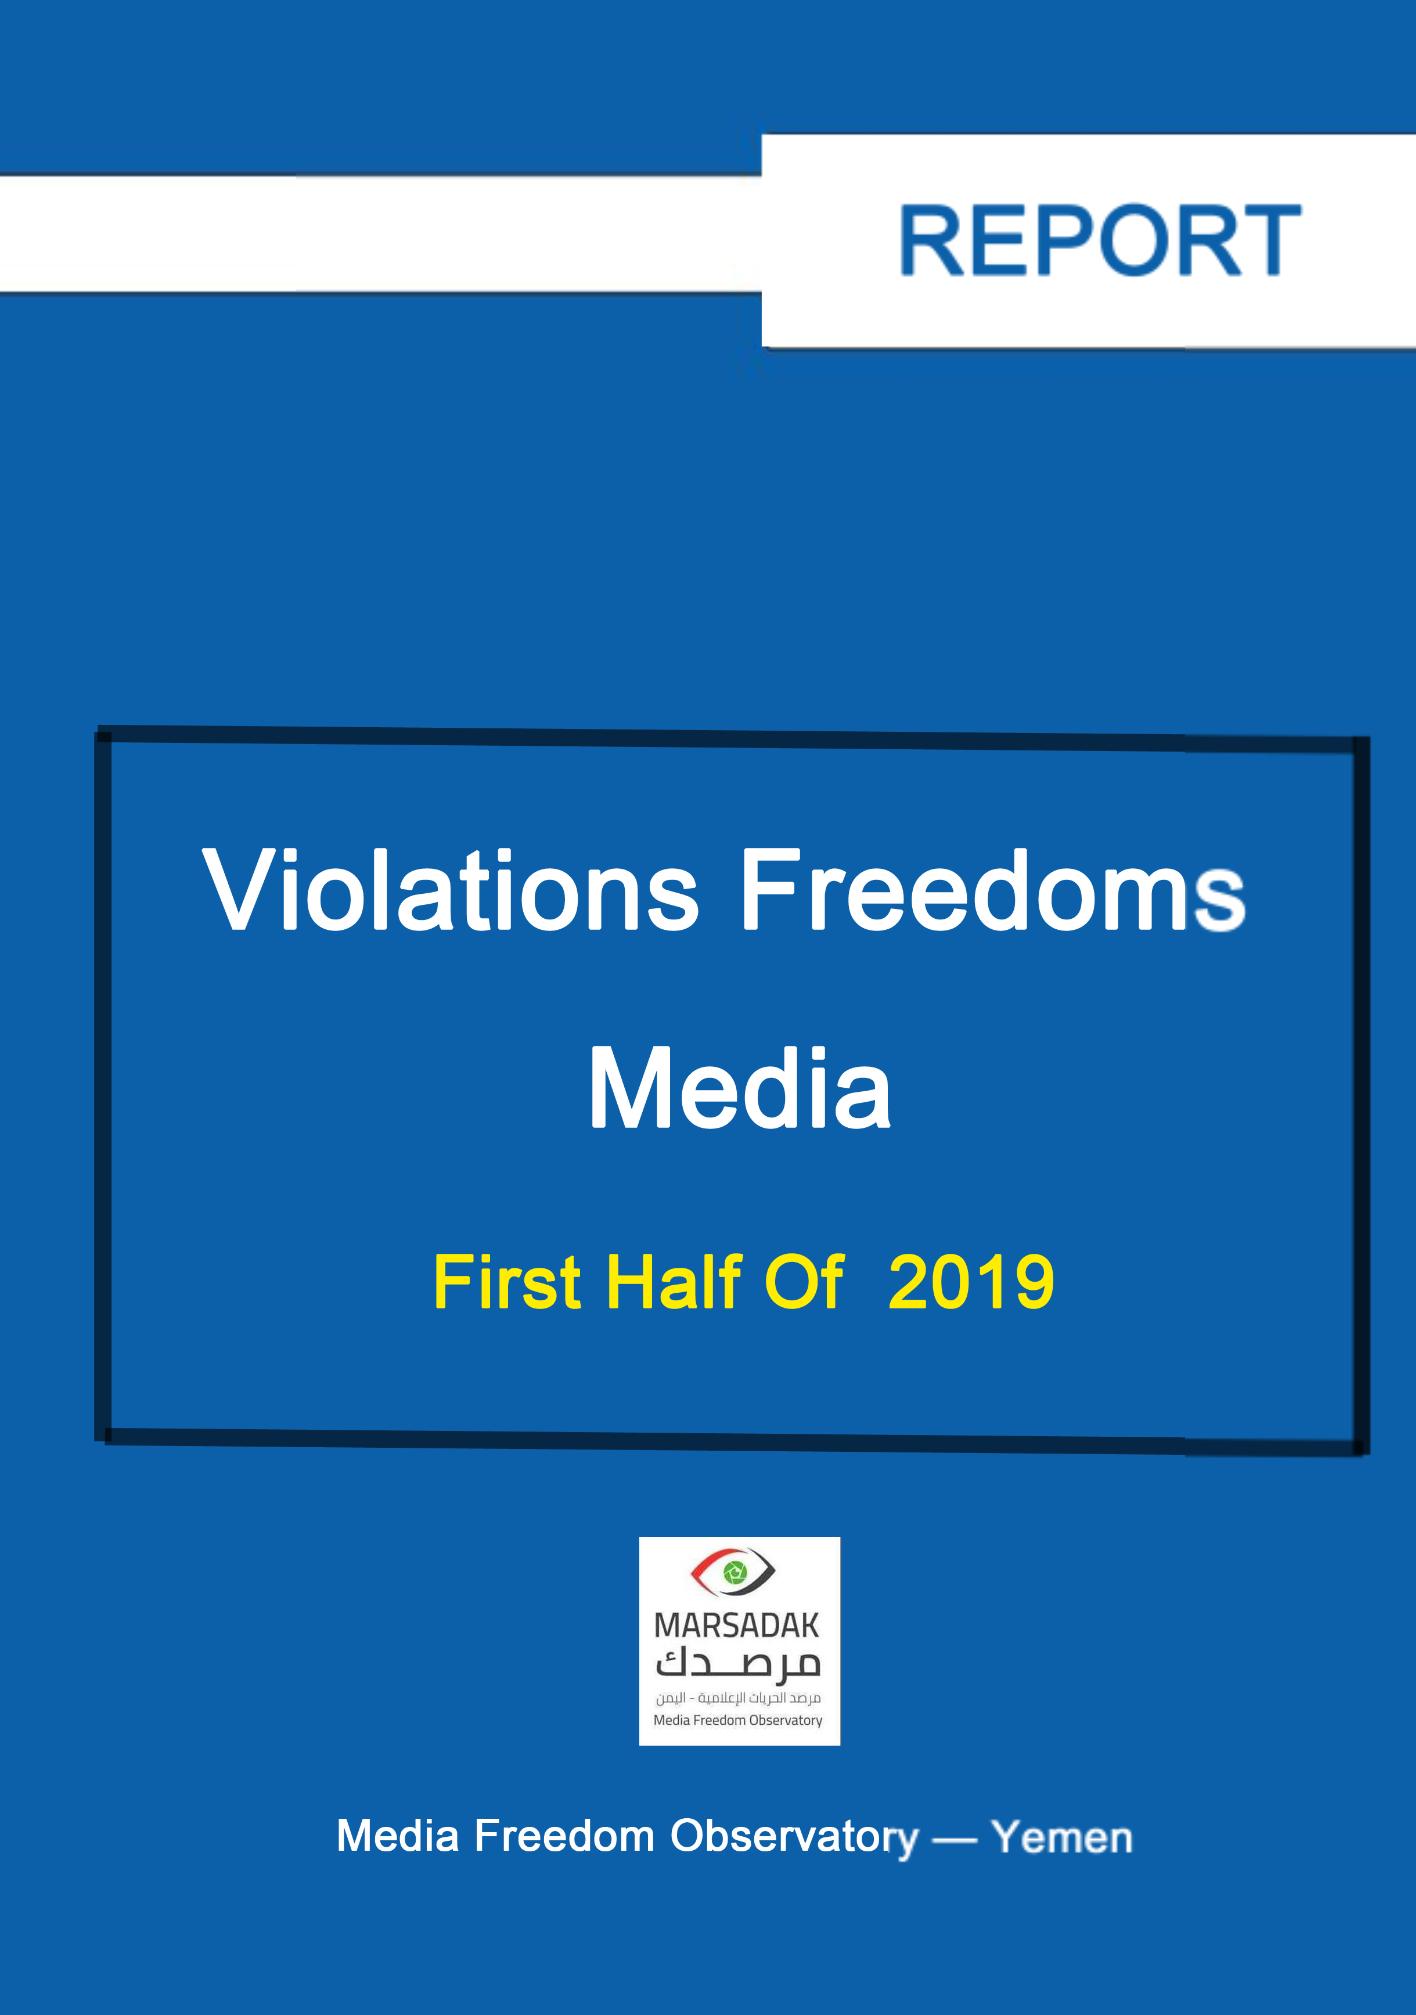 Yemeni Media Targeted: 75 Violations in 6 Months